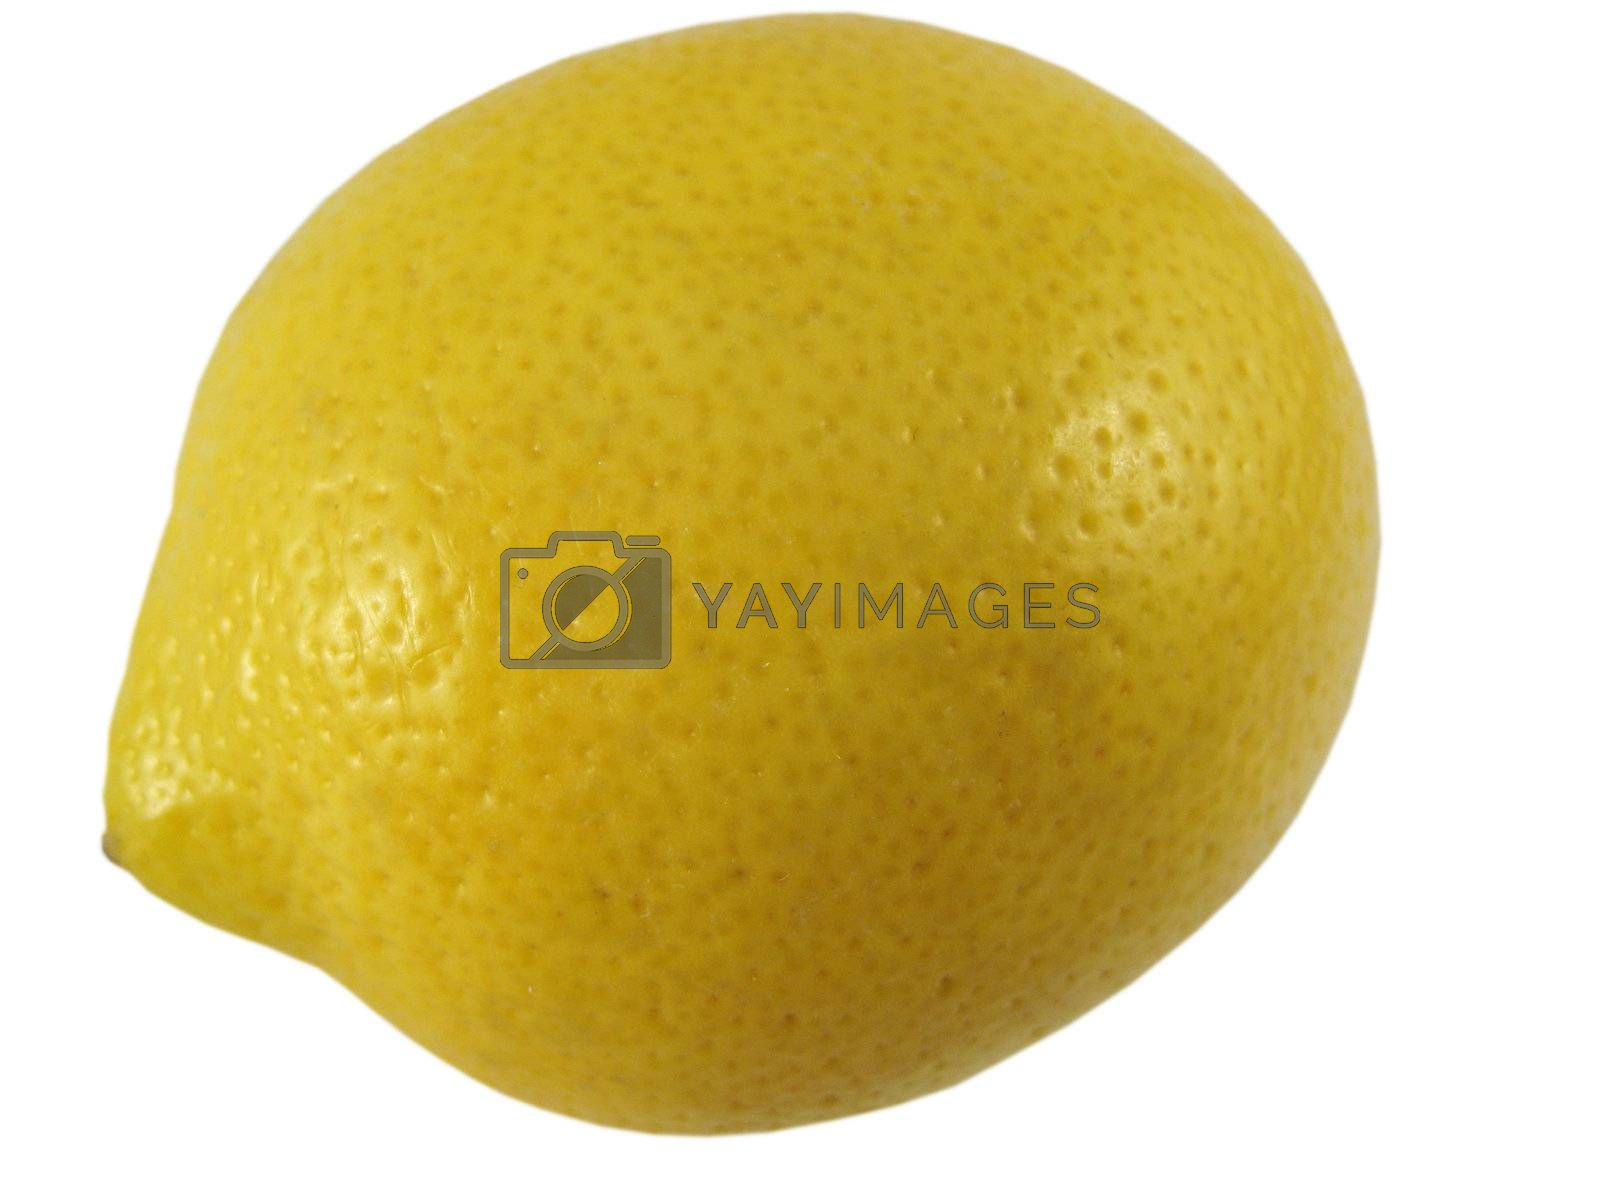 Lemon by jclardy